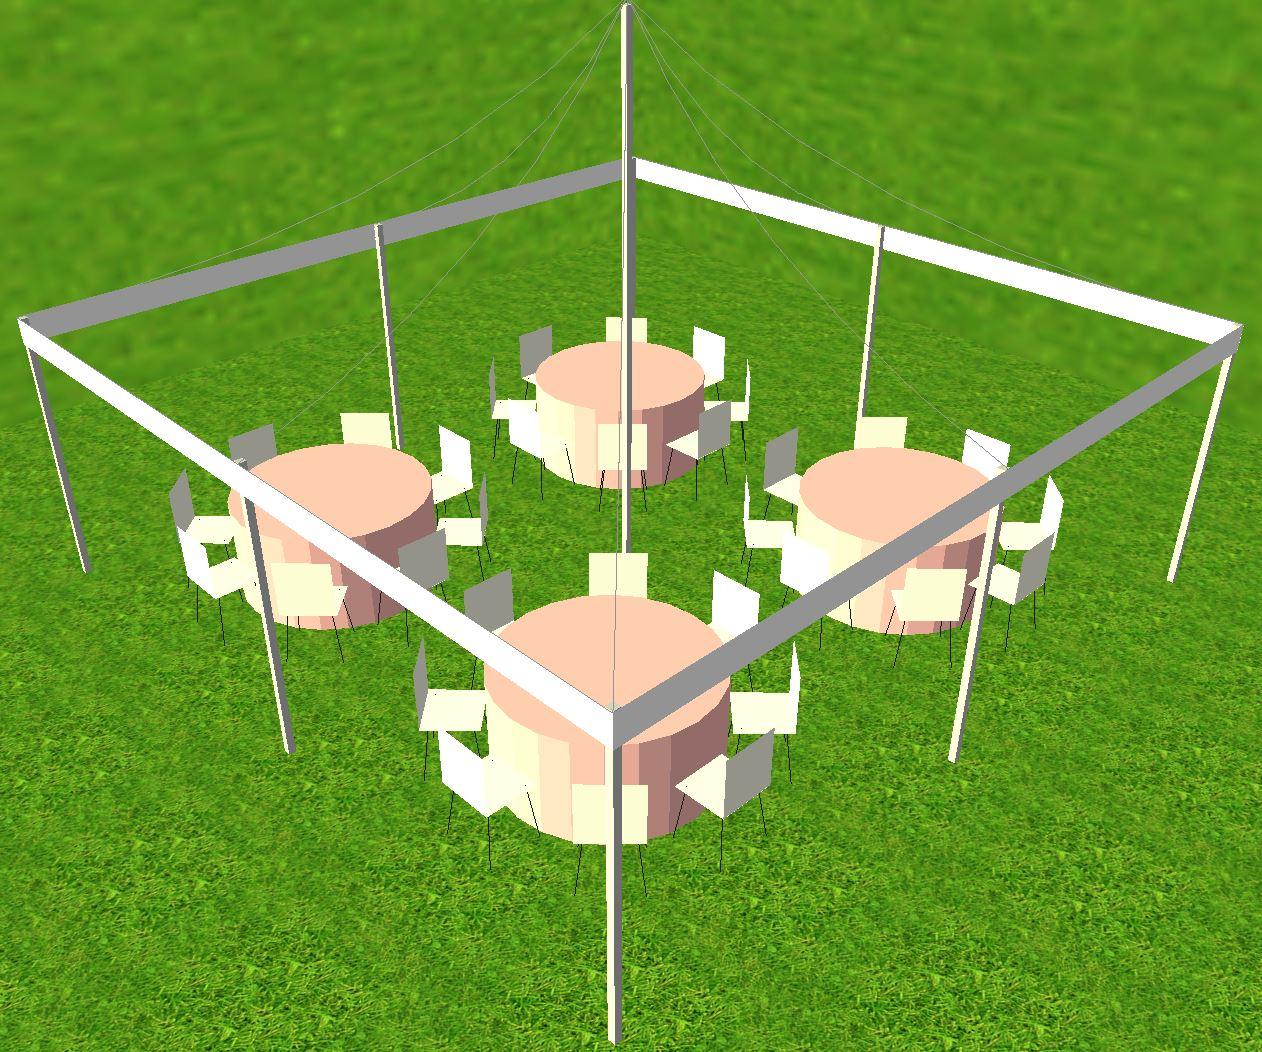 20x20 tent - Tent Setup Ideas